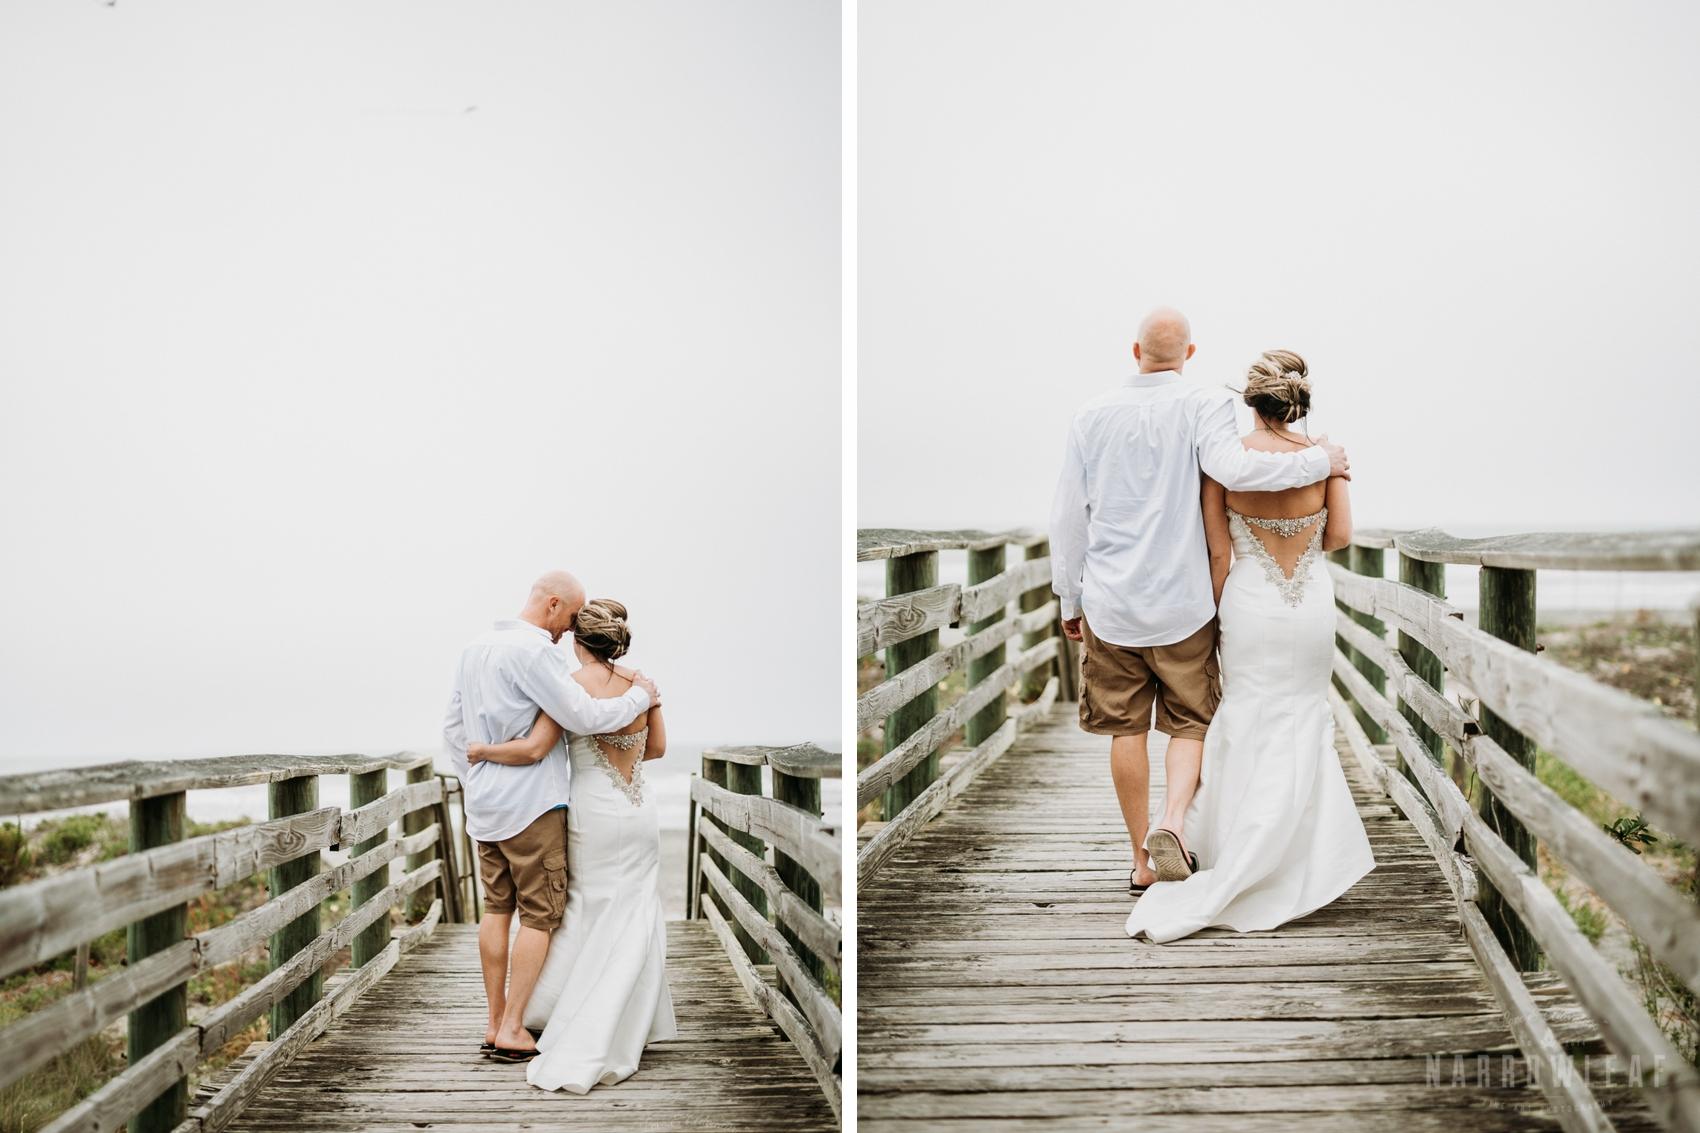 south-carolina-folly-beach-destination-wedding-019-020.jpg